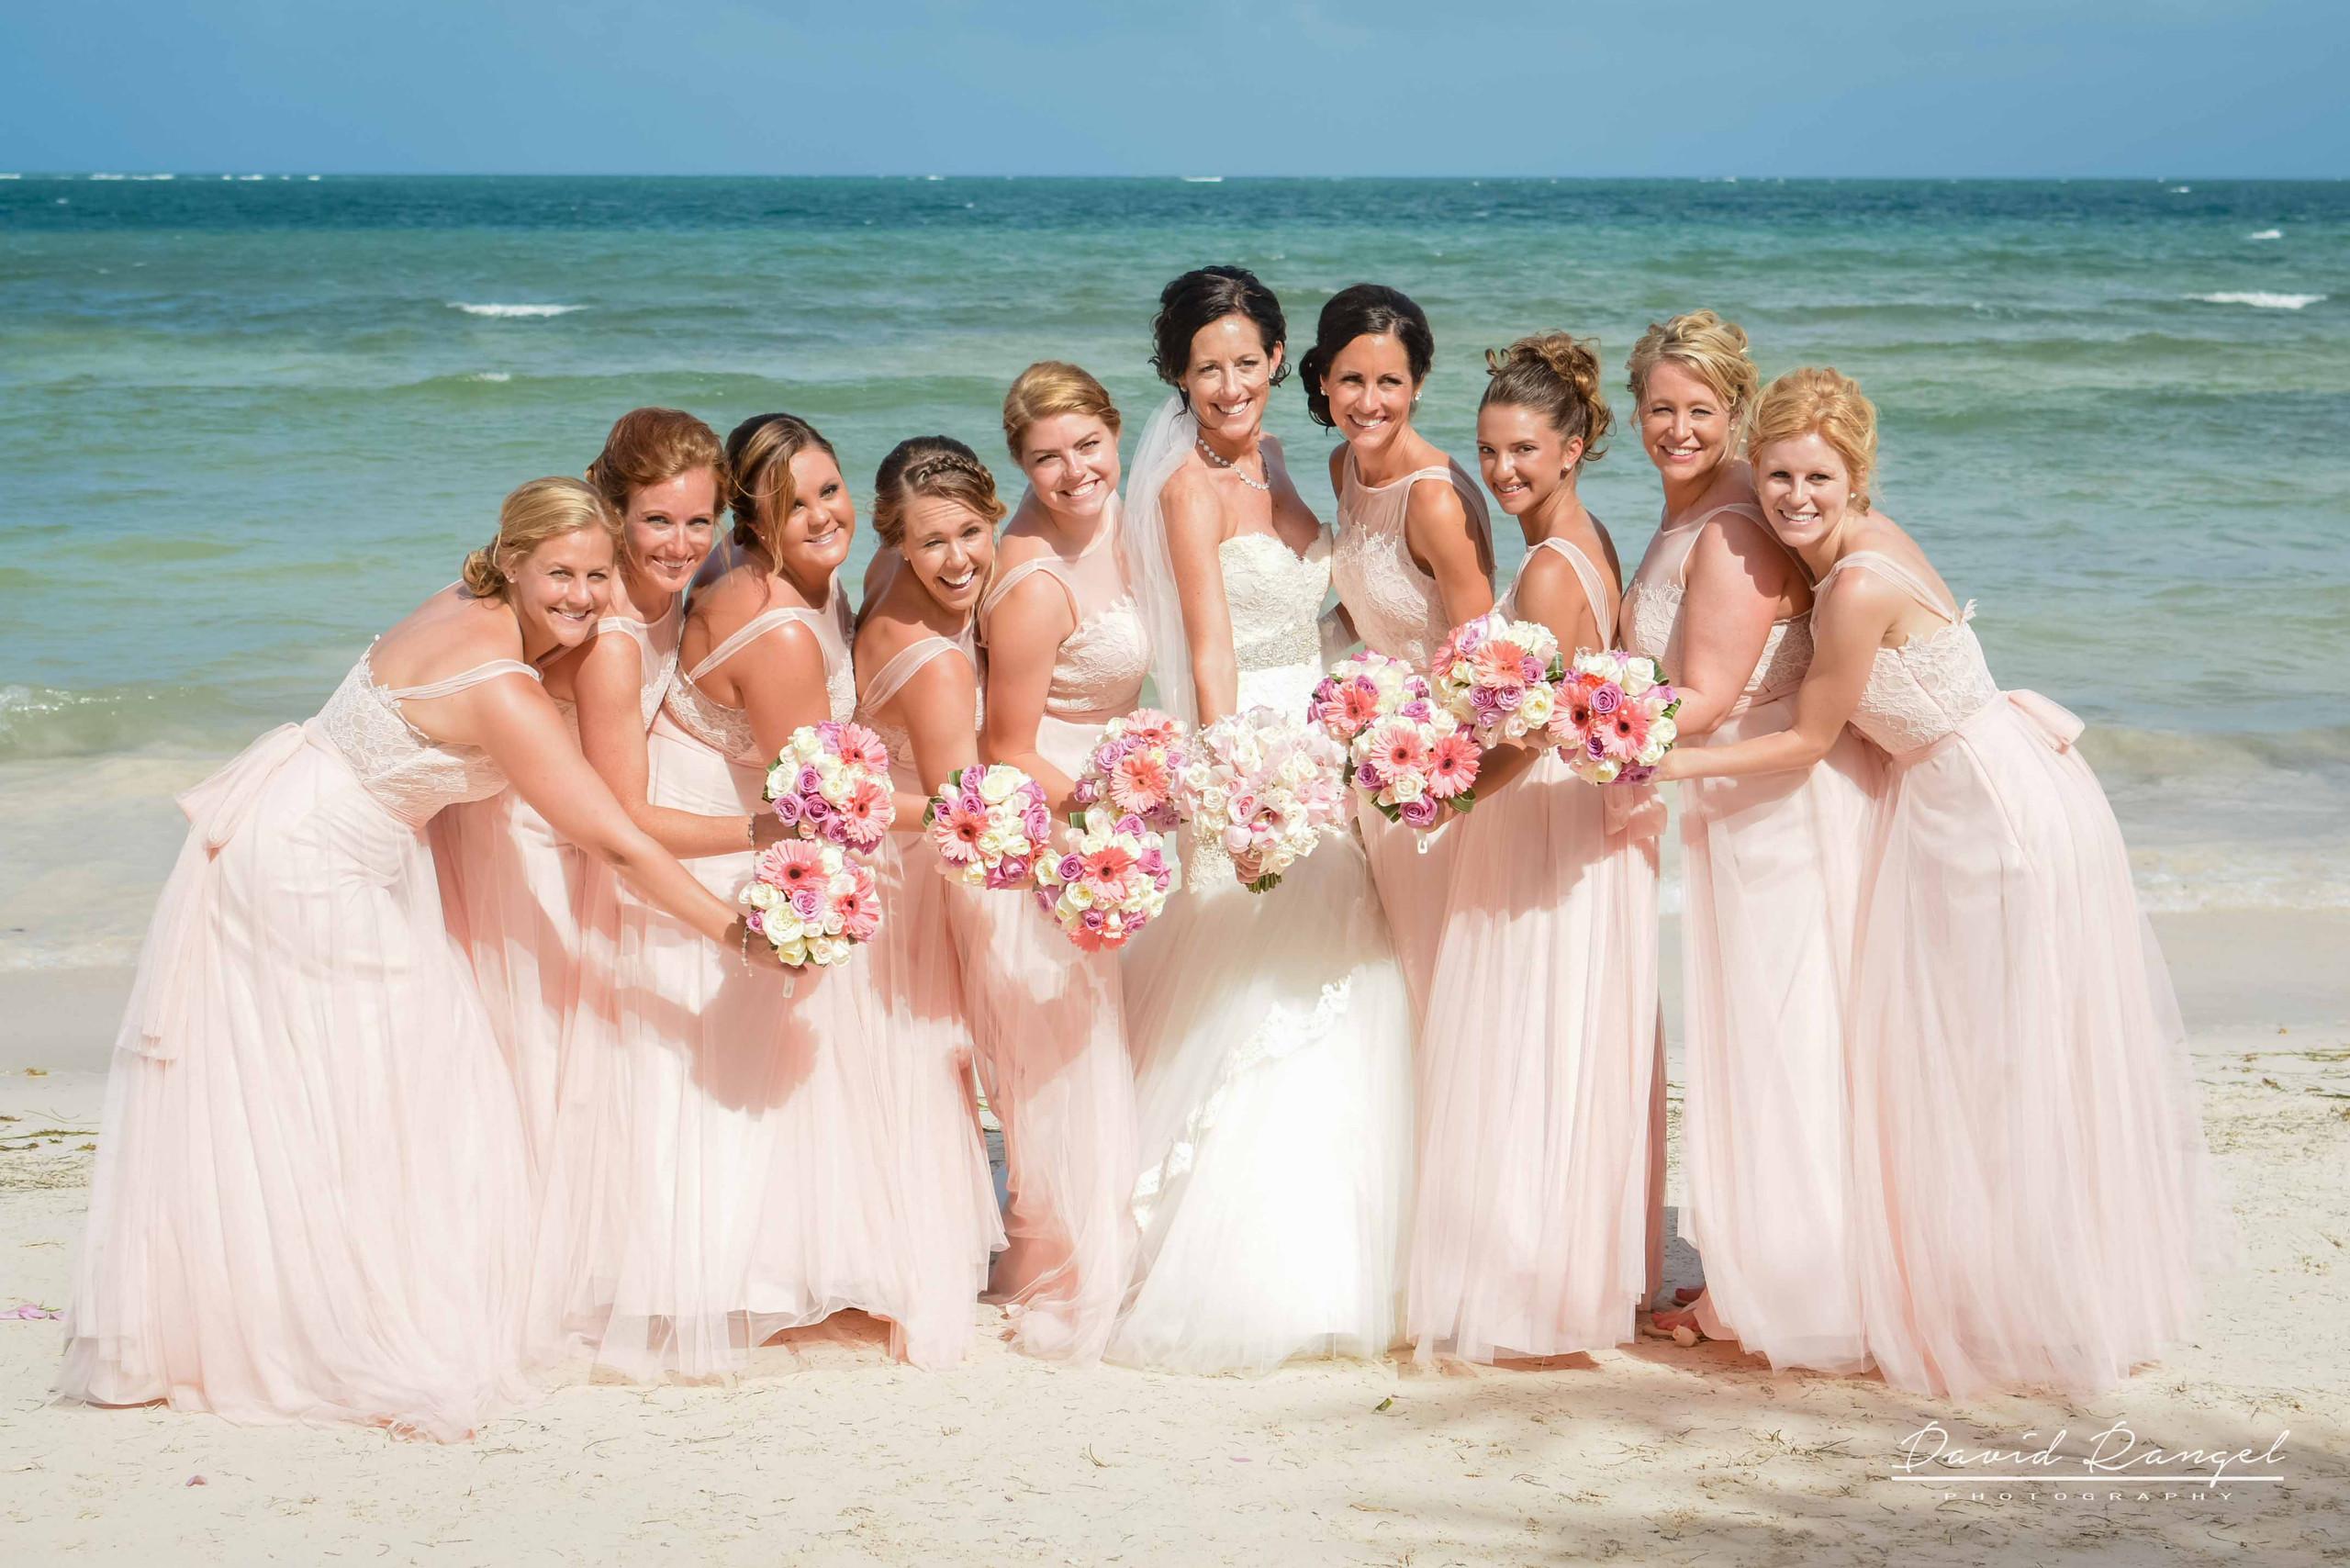 brides+maids+on+the+beach